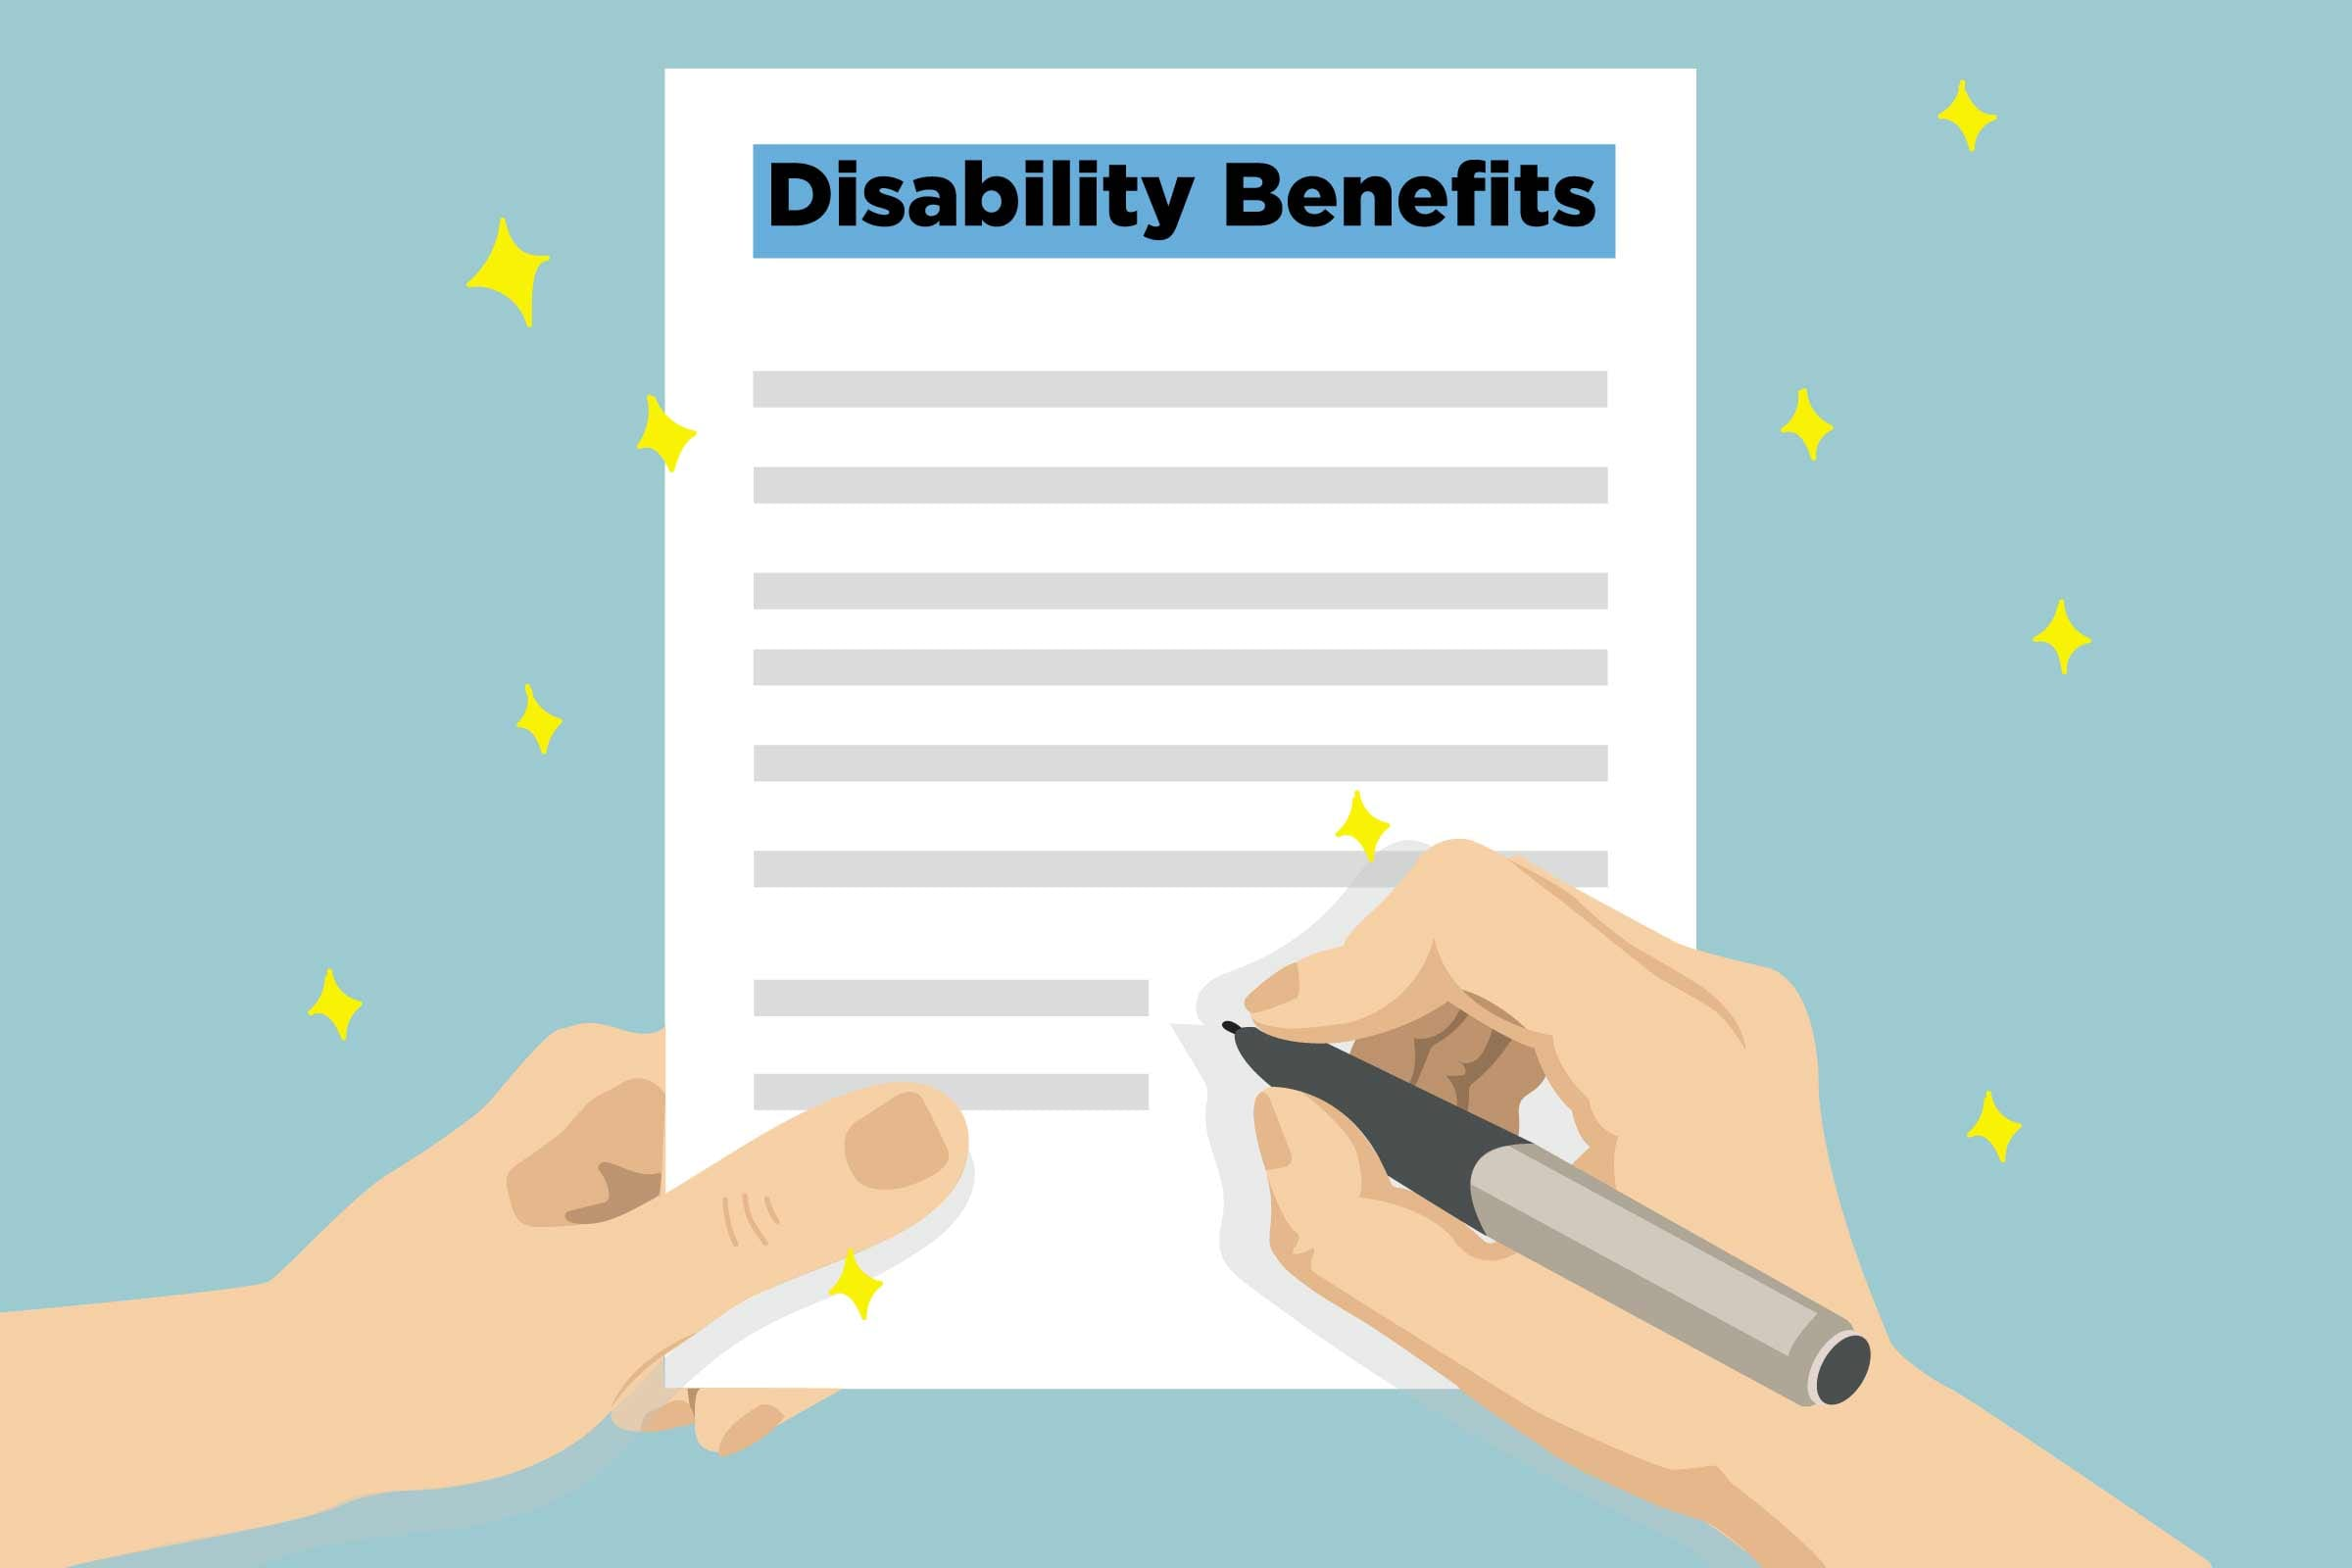 Getting Social Security Disability for Rheumatoid Arthritis